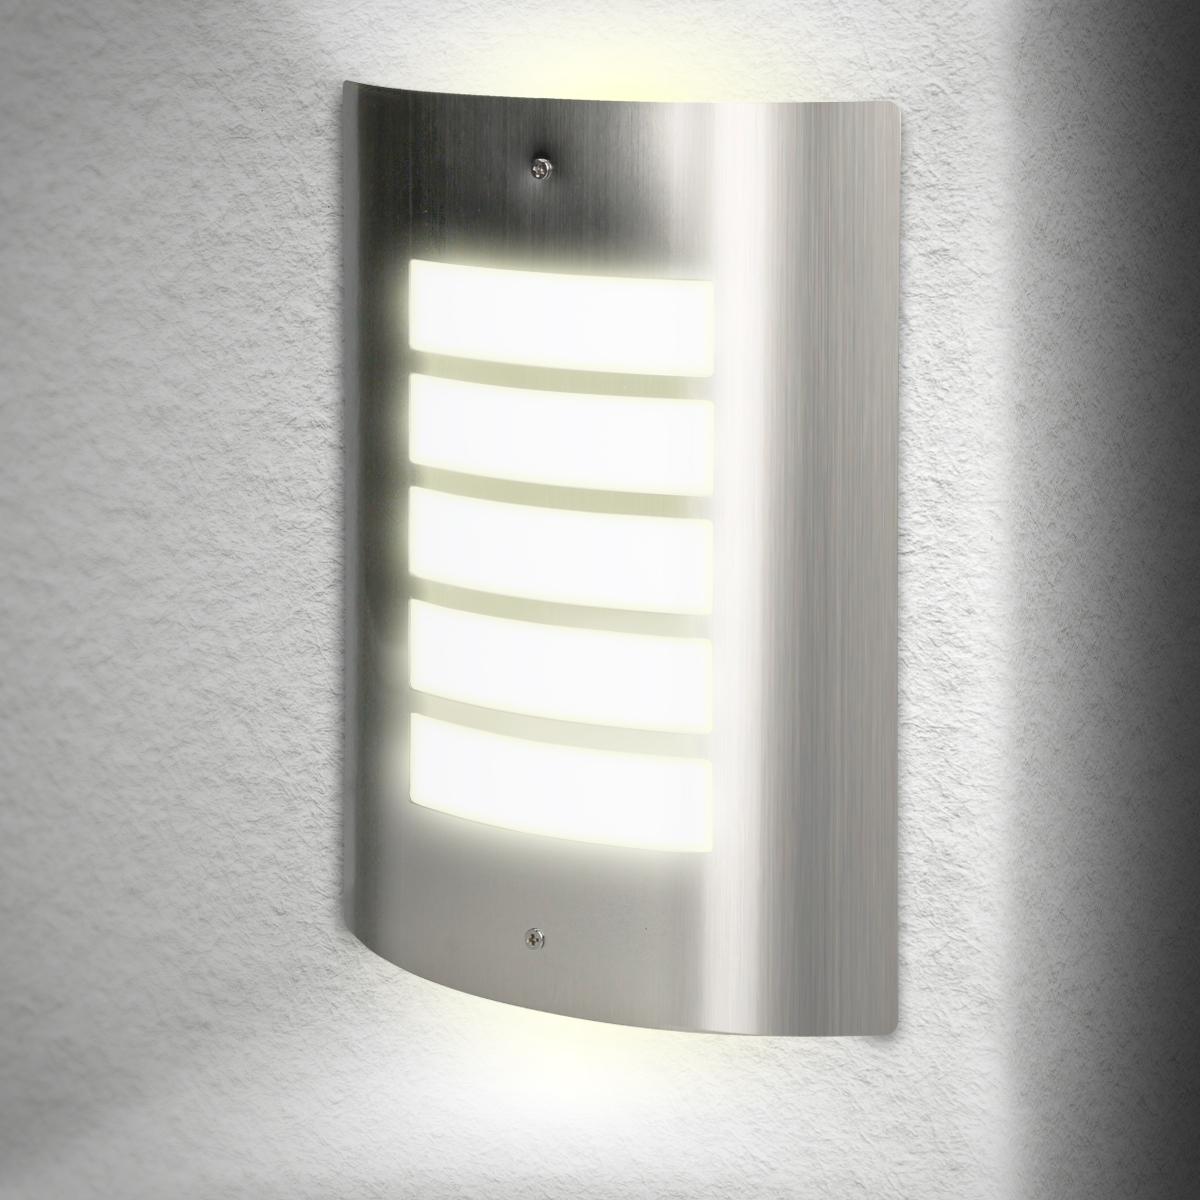 au enleuchte wandleuchten wandlampe lampe licht edelstahl e27 fassung 5w led ebay. Black Bedroom Furniture Sets. Home Design Ideas